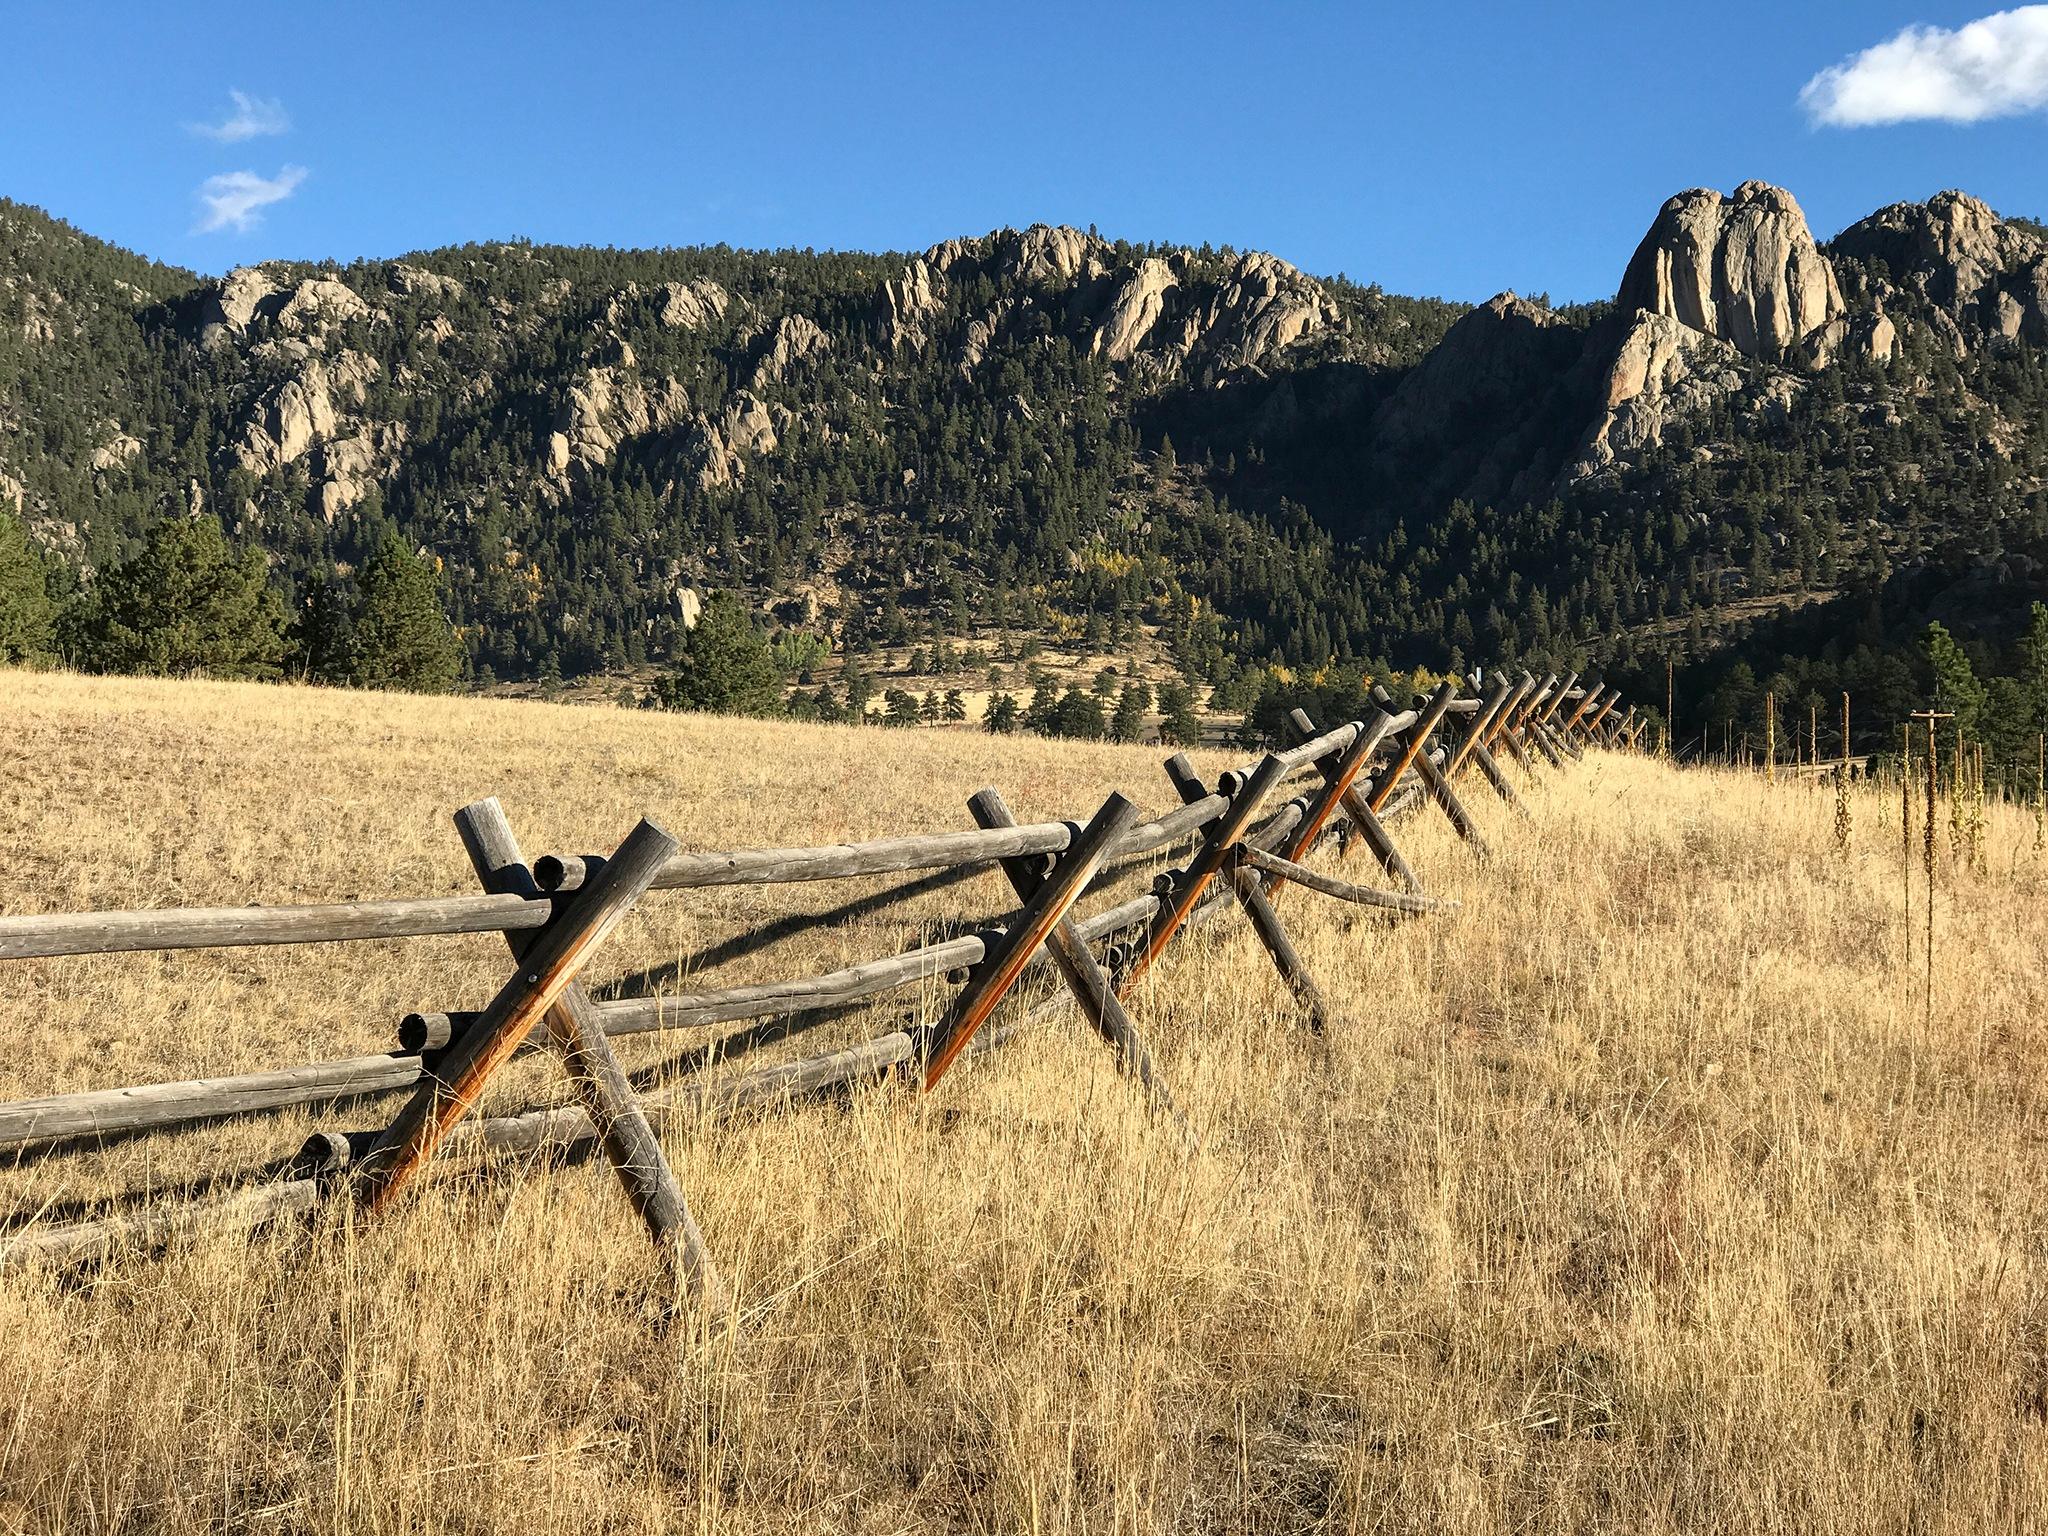 Rustic, Buck Rail Fence by Richard Hahn